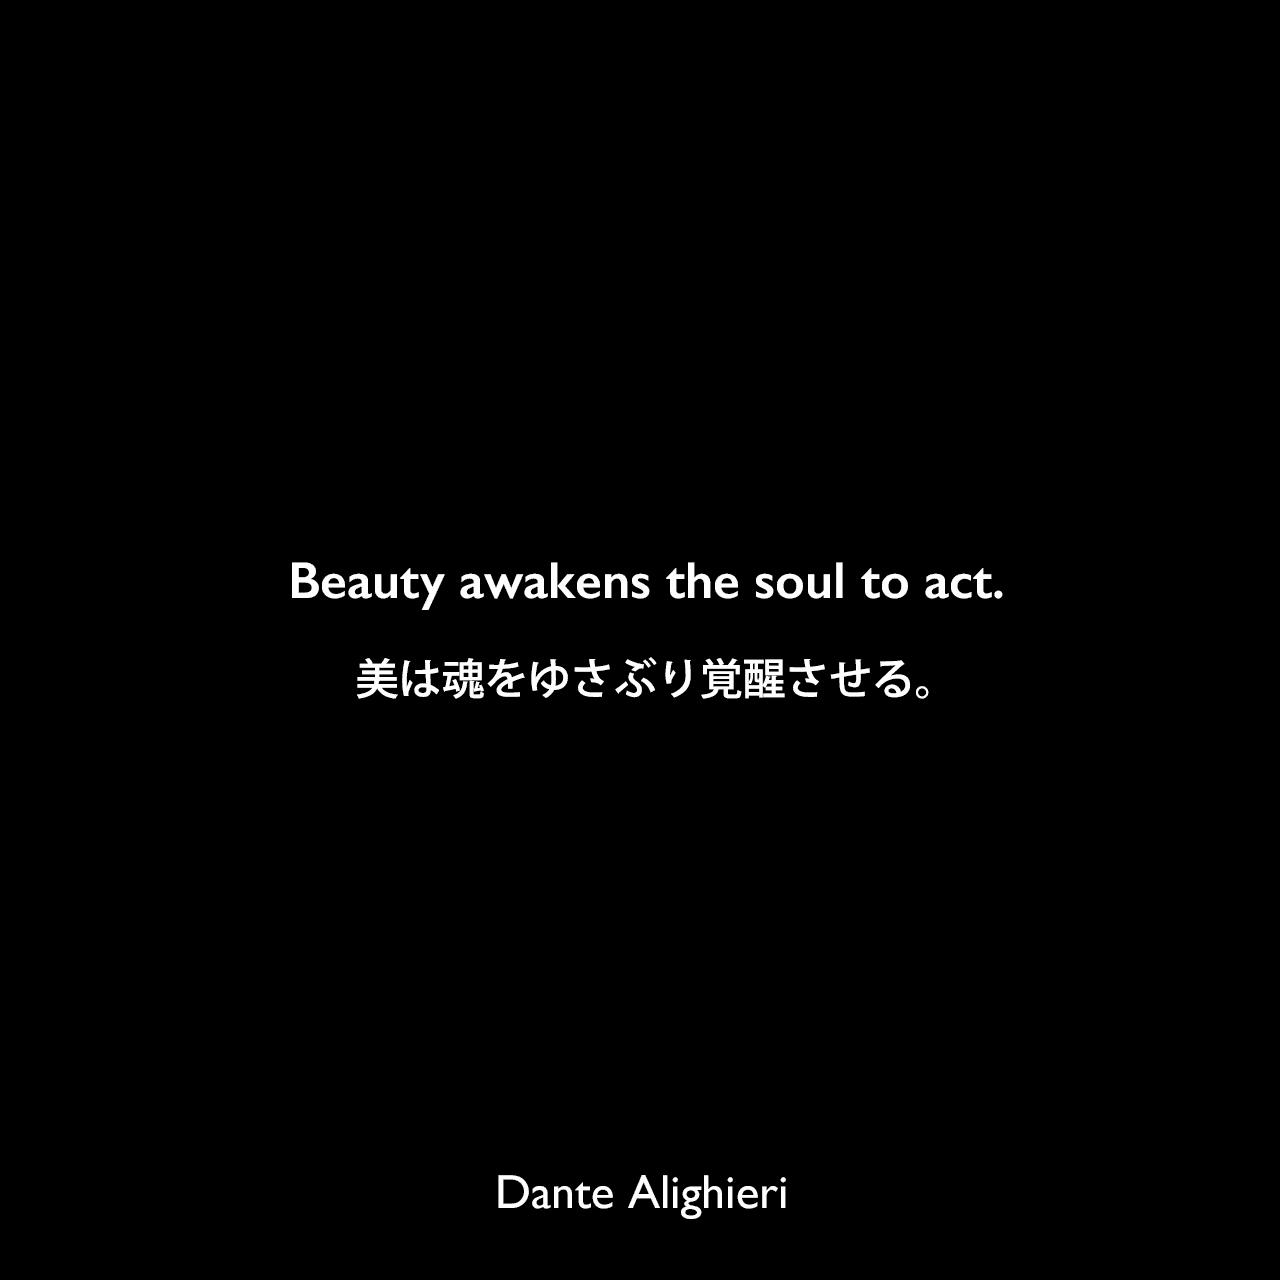 Beauty awakens the soul to act.美は魂をゆさぶり覚醒させる。Dante Alighieri